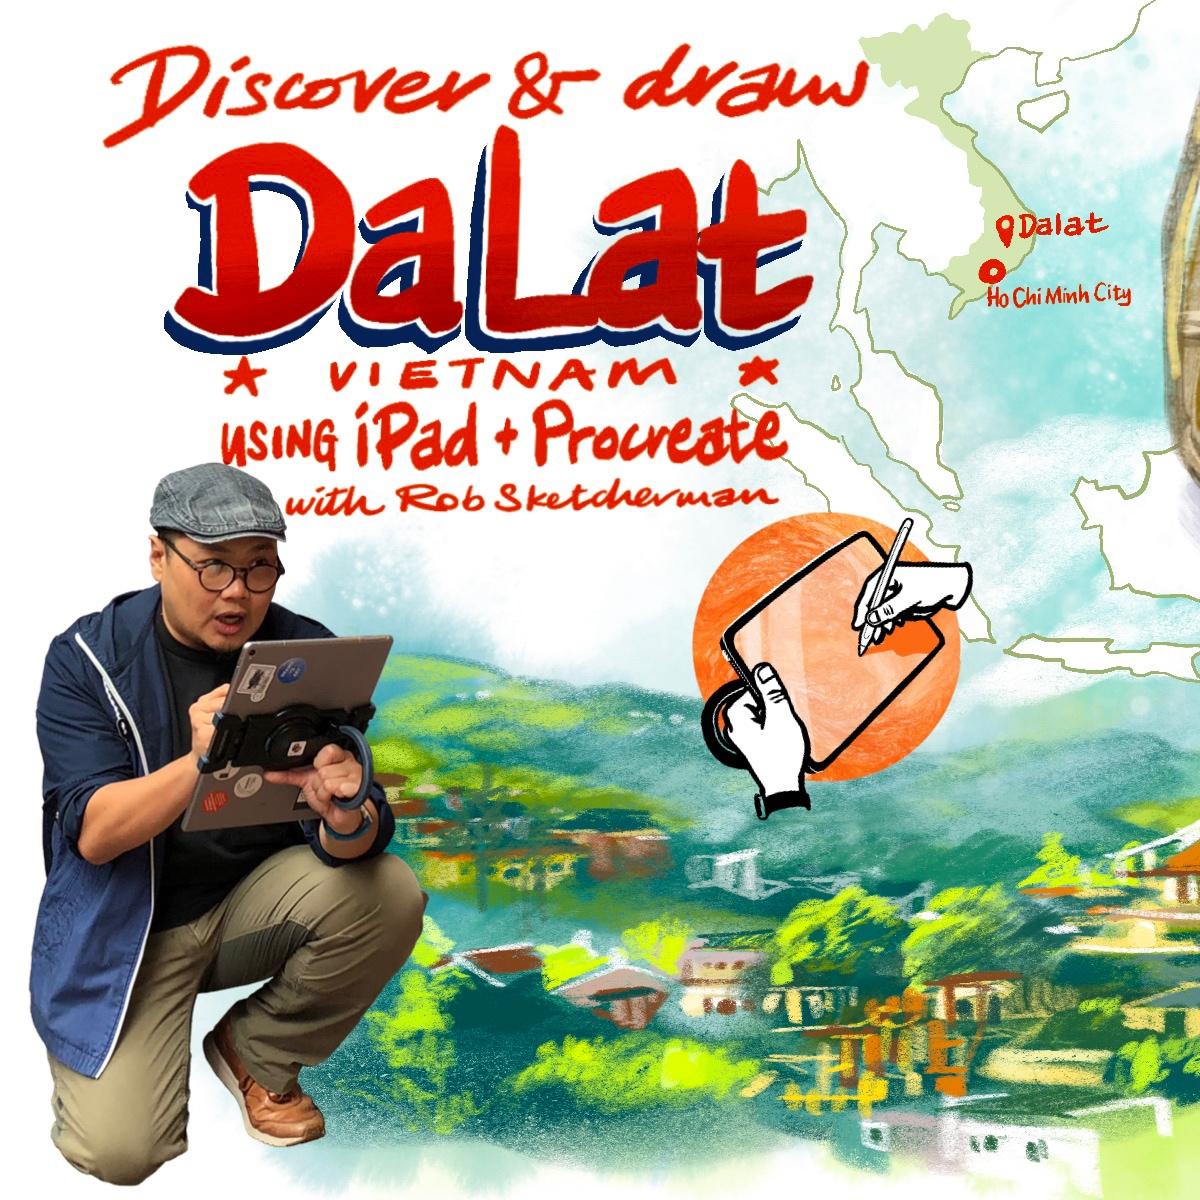 Dalat_1-Sketcherman.jpeg